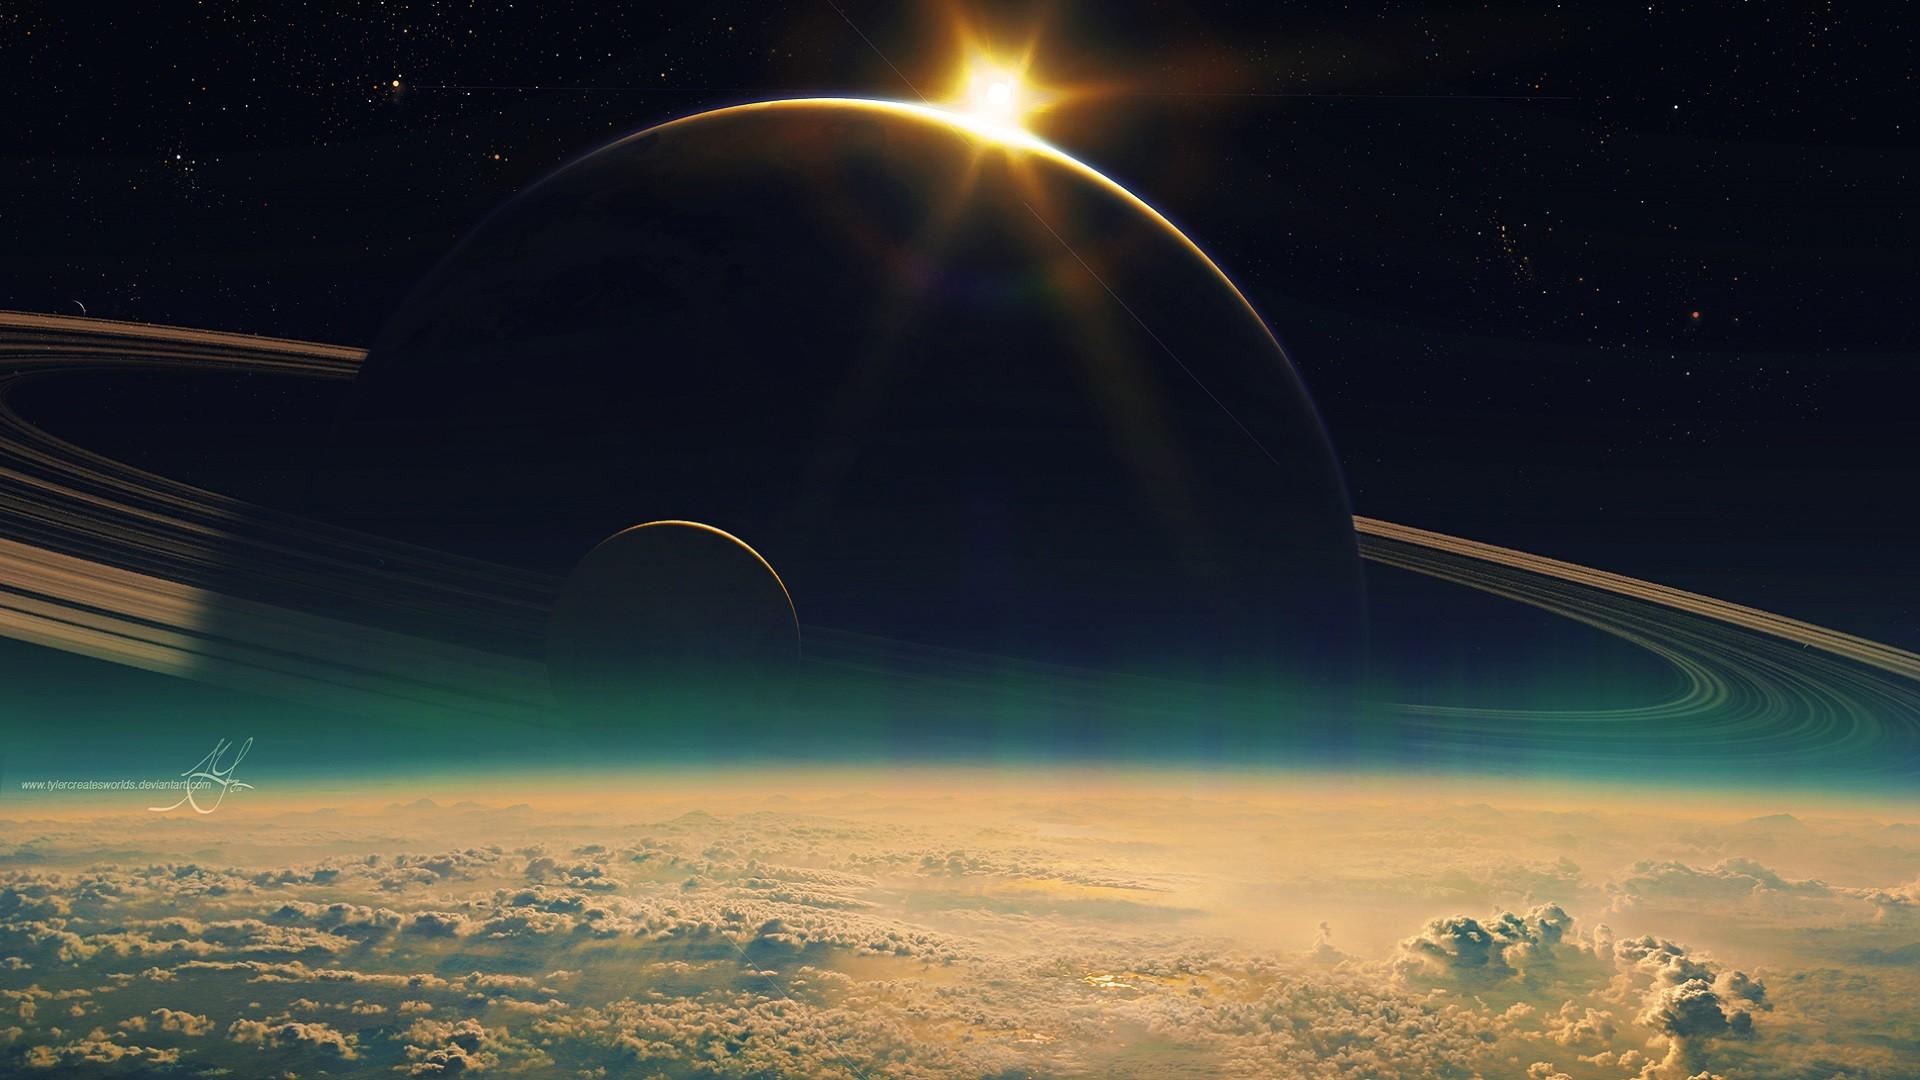 Space Wallpaper HD 1080P Background © genovic.com